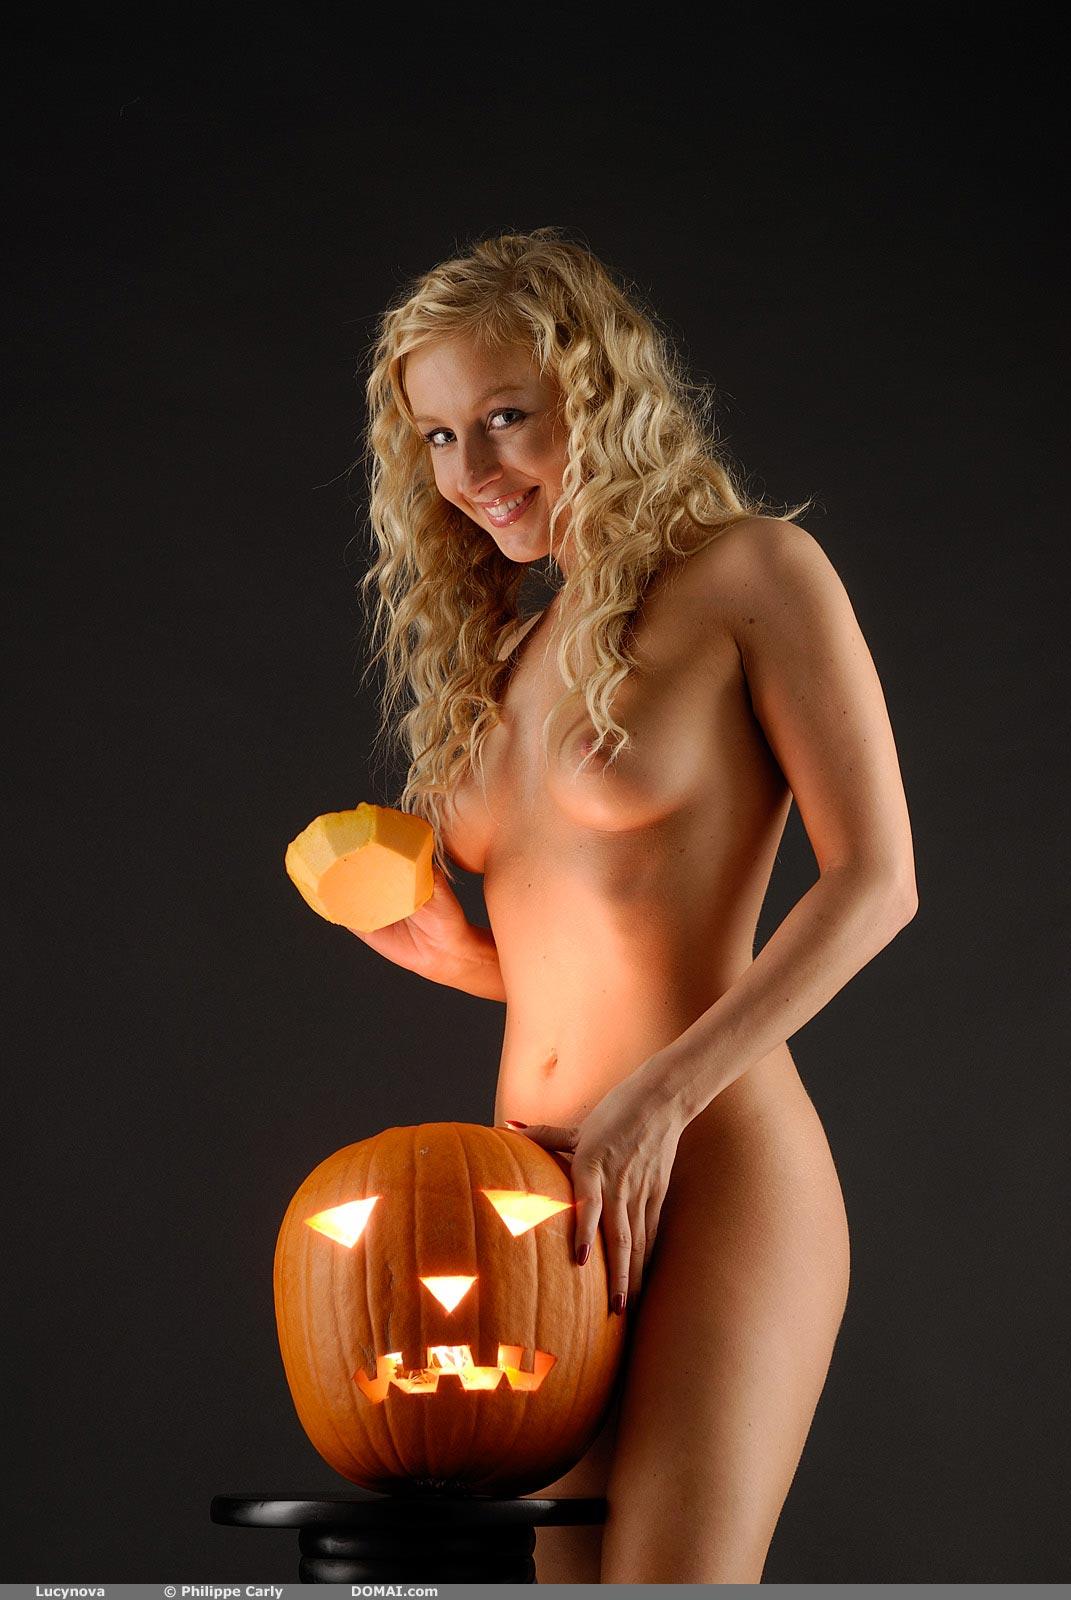 Lucynova Halloween - Nudespuricom-6888